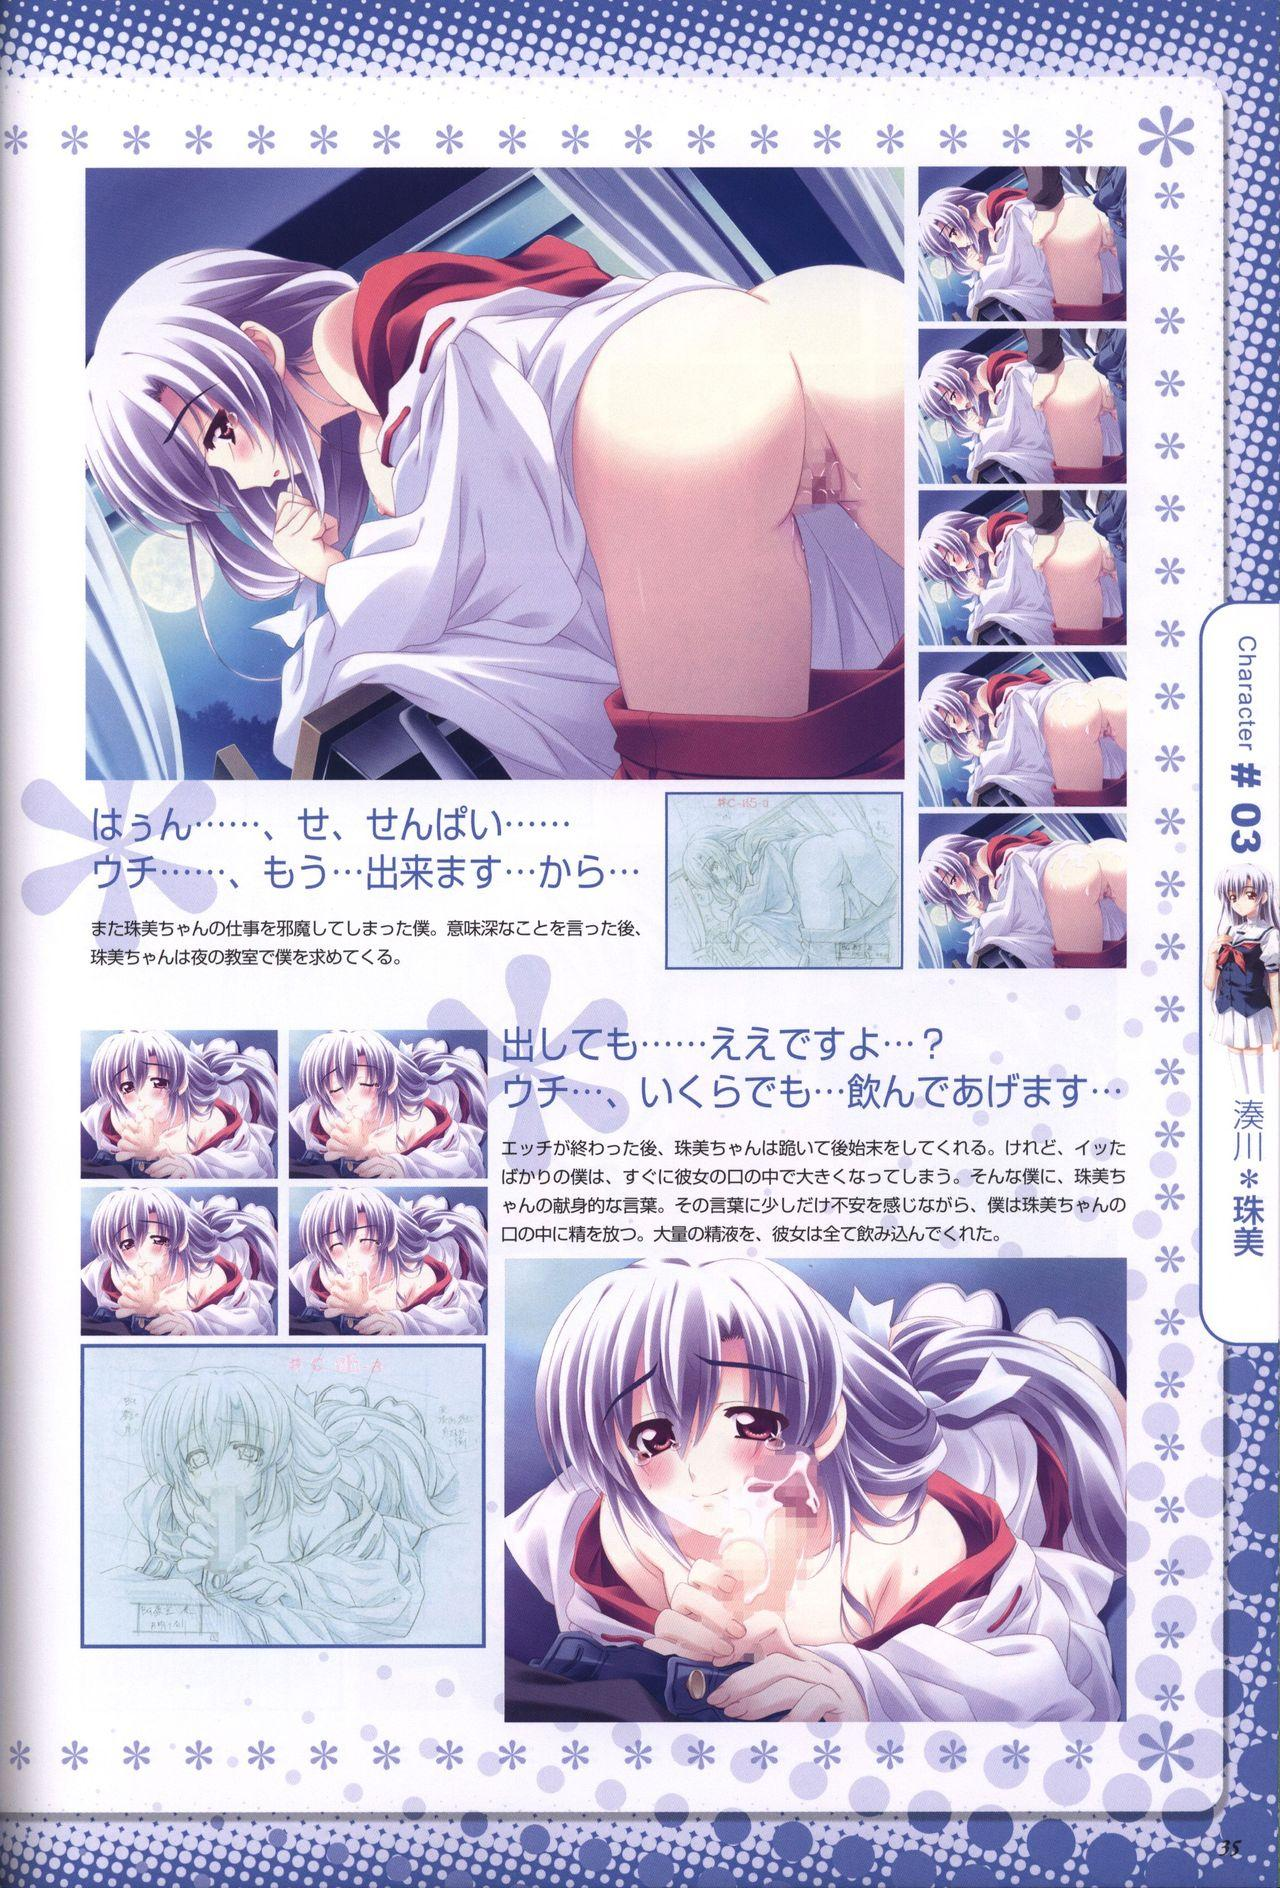 Moshimo Ashita ga Harenaraba official fanbook 35